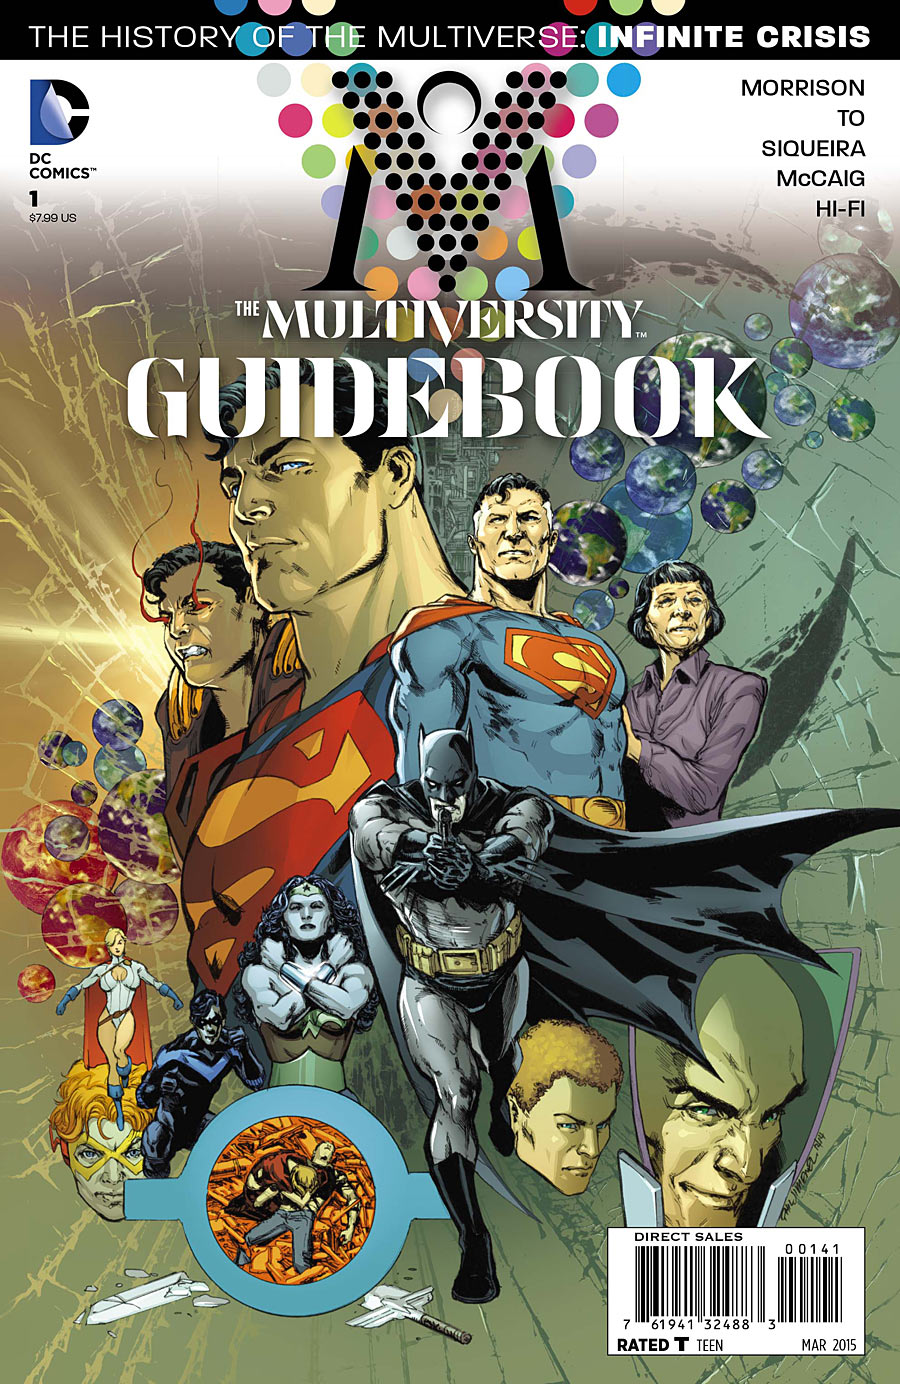 The Multiversity Guidebook Vol 1 1 Jimenez Variant.jpg